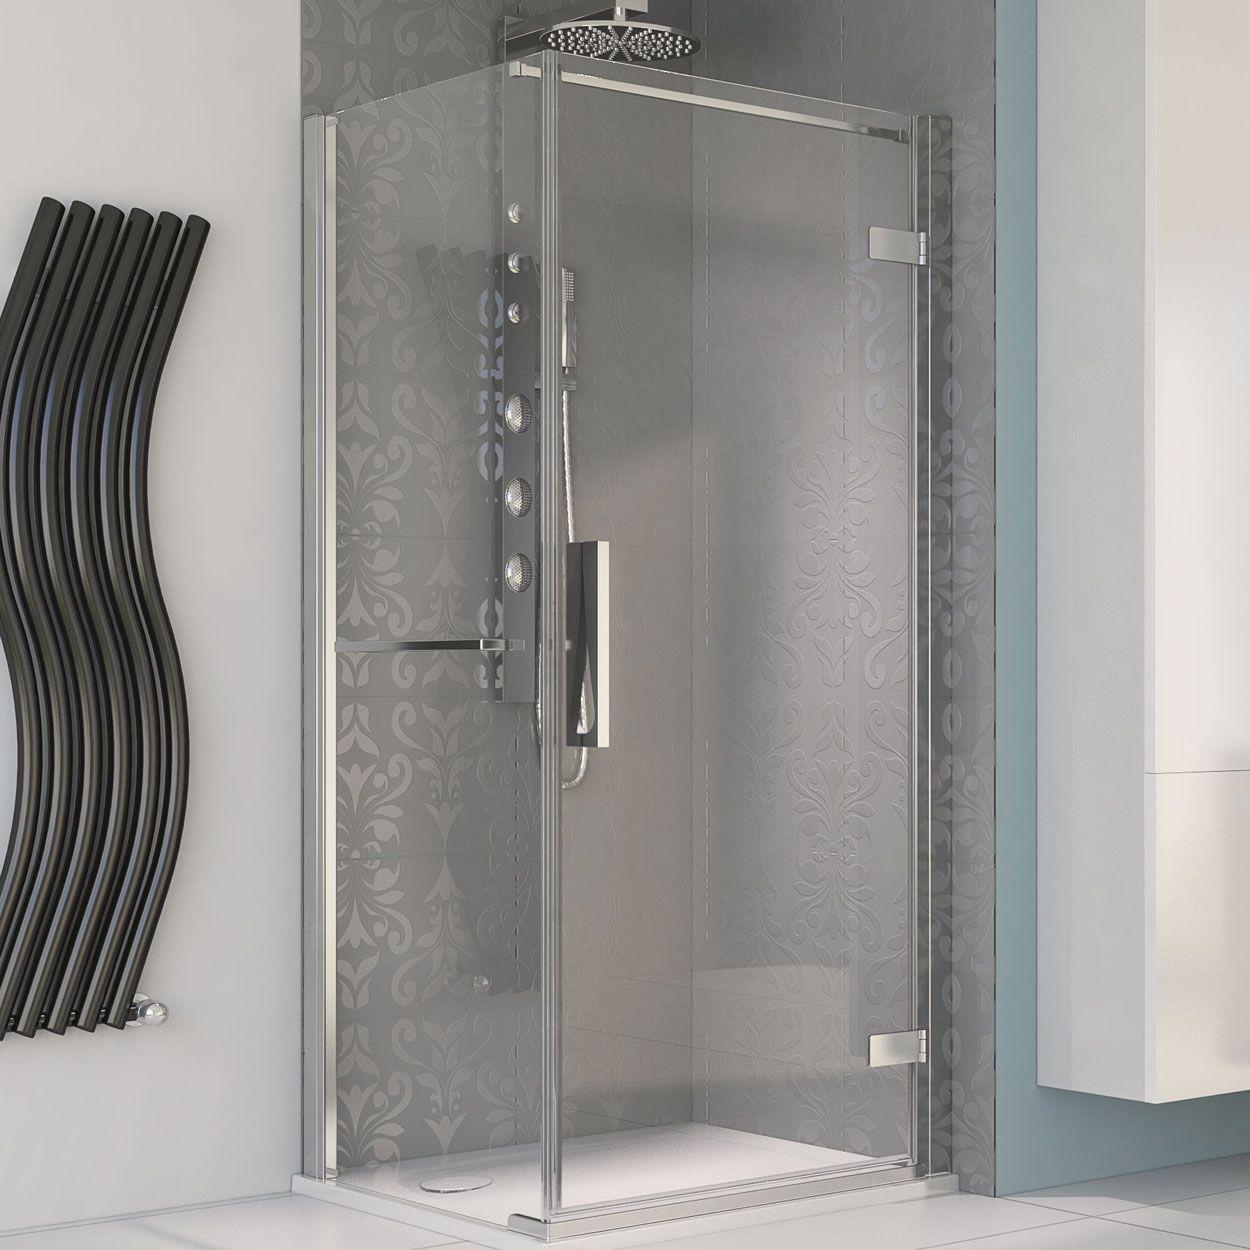 Aqualux Aqua 8 Hinge Pivot Shower Door And Side Panel 1200mm X 900mm Silver Frame Clear Glass 490 Shower Doors Bathroom Shower Doors Clear Glass